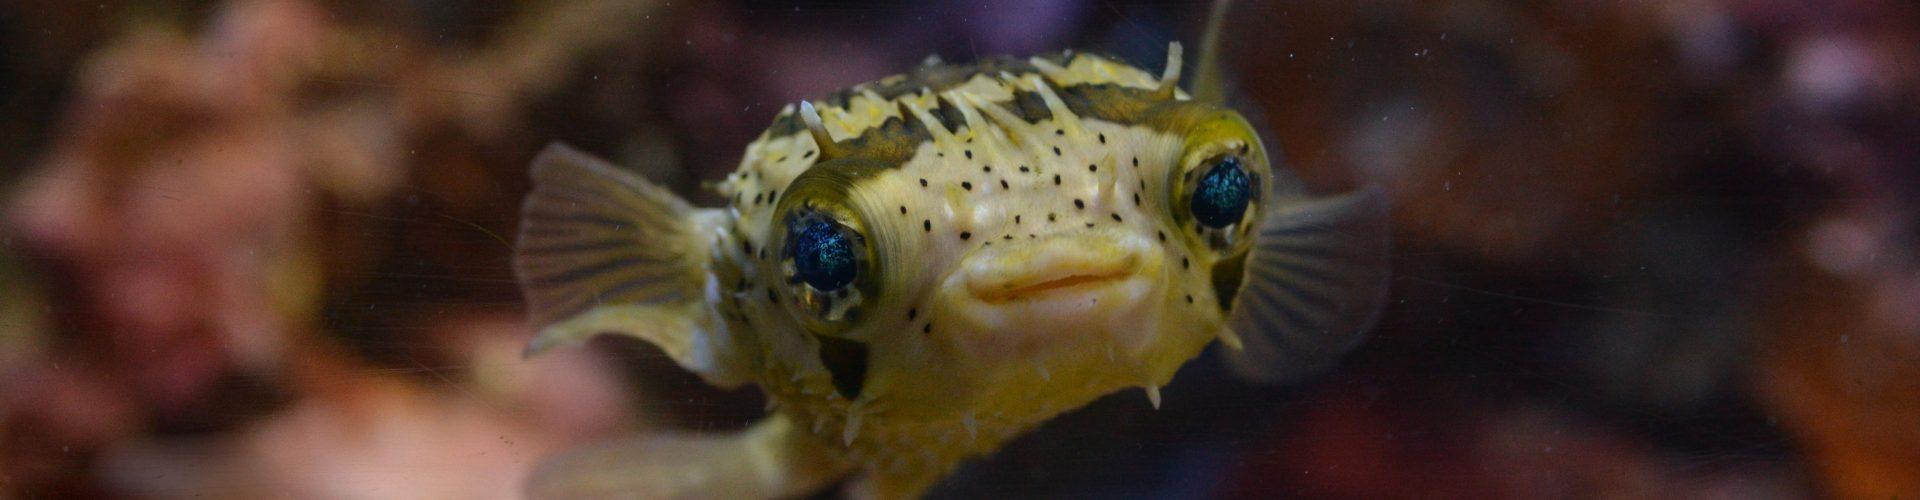 NMFRI Gdynia Aquarium